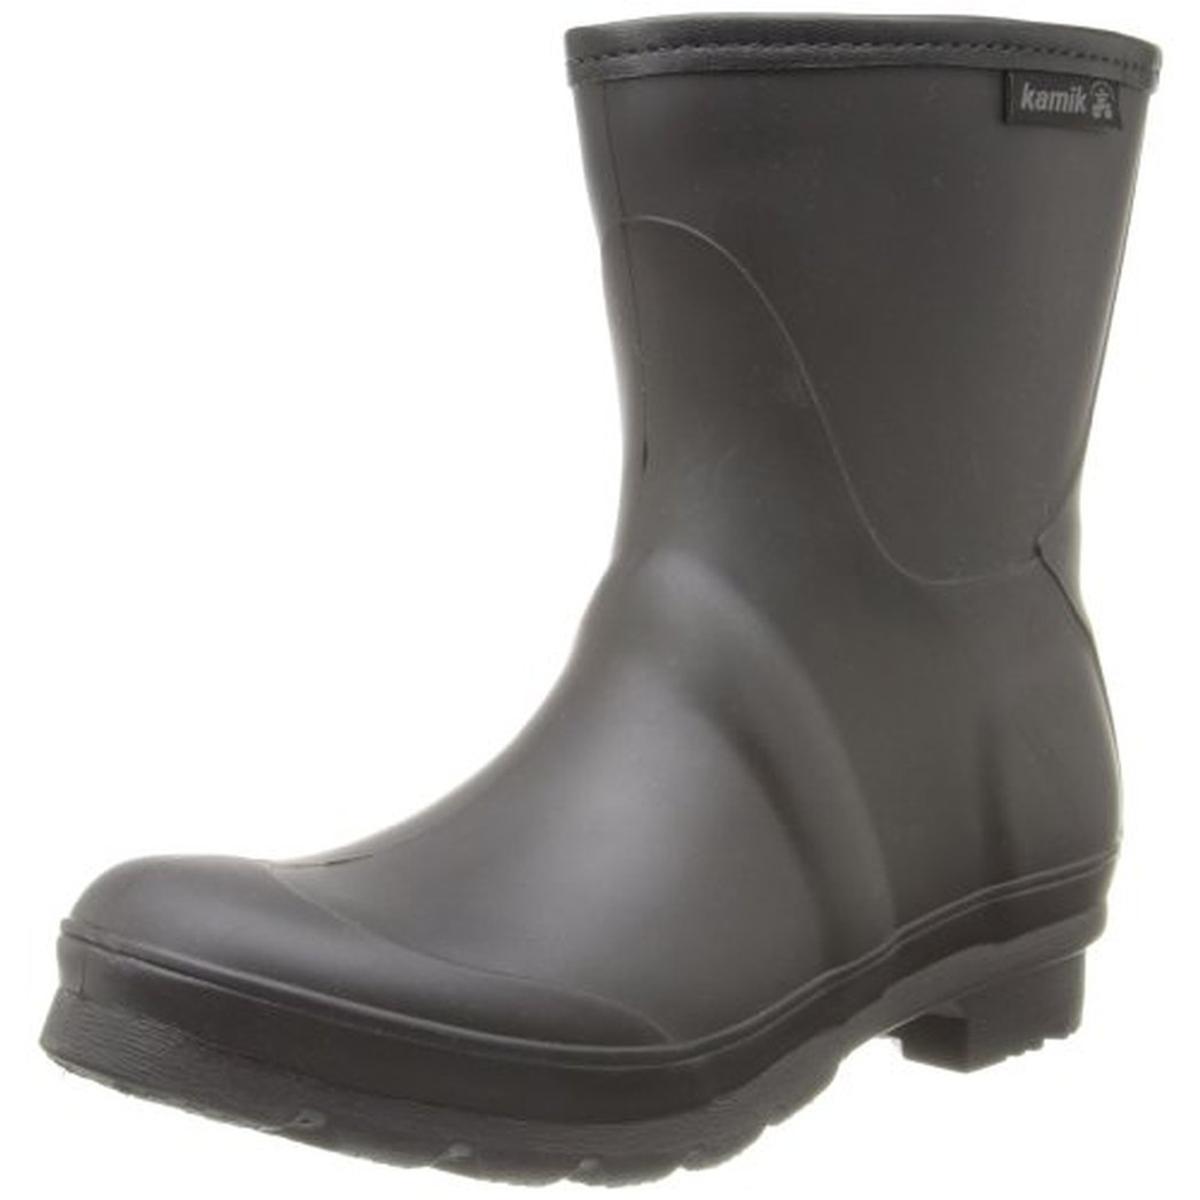 Luxury Amazoncom  Kamik Women39s Heidi Rain Boot  MidCalf